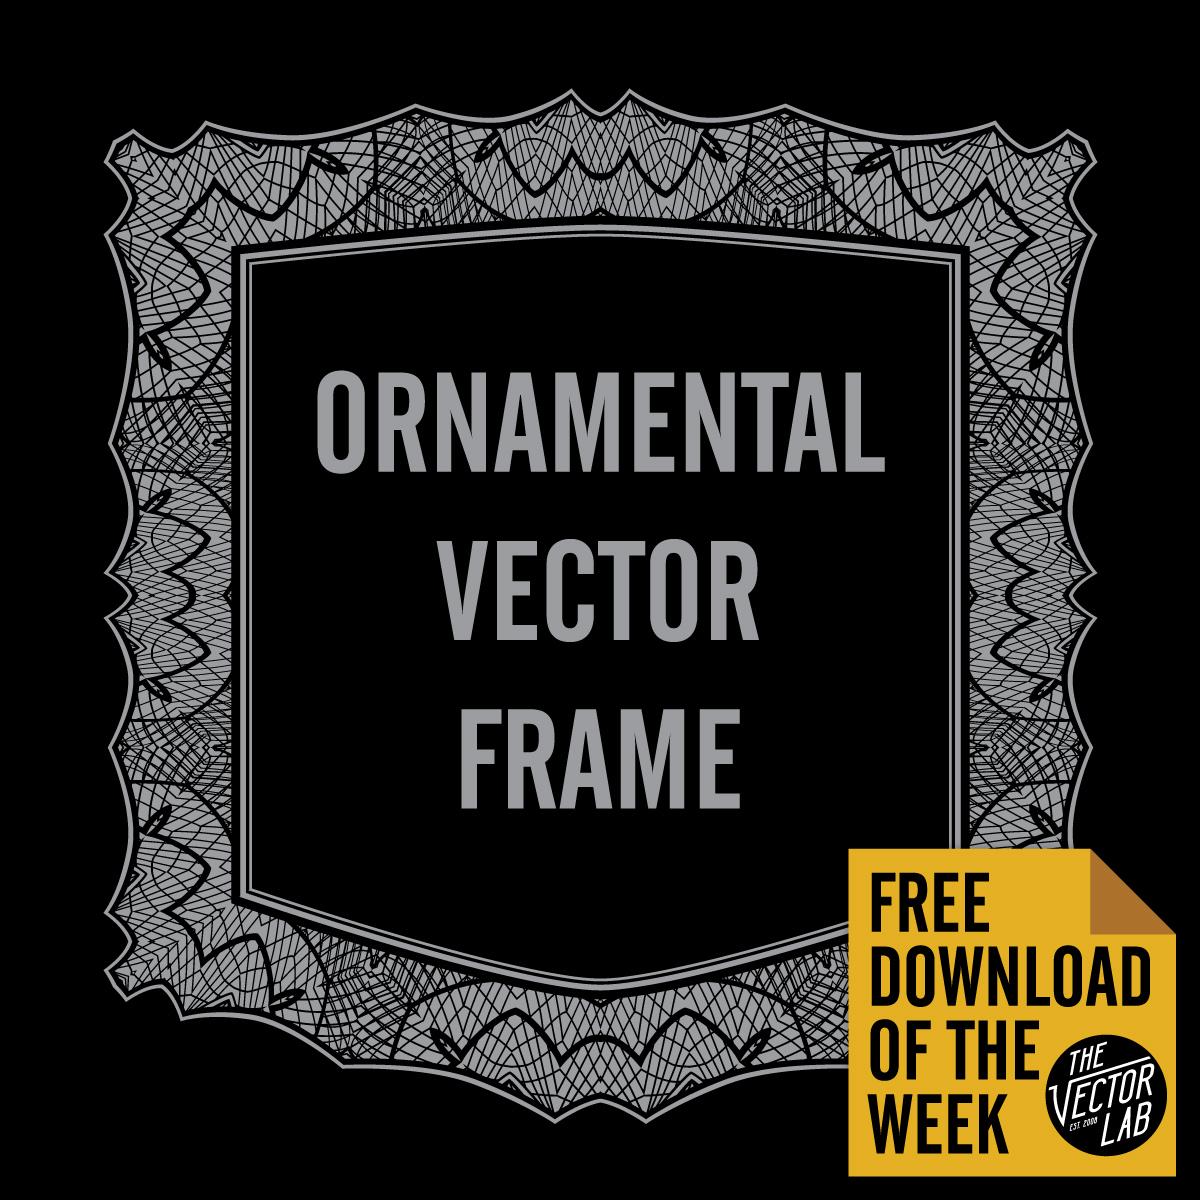 Ornamental-Vector-Frame